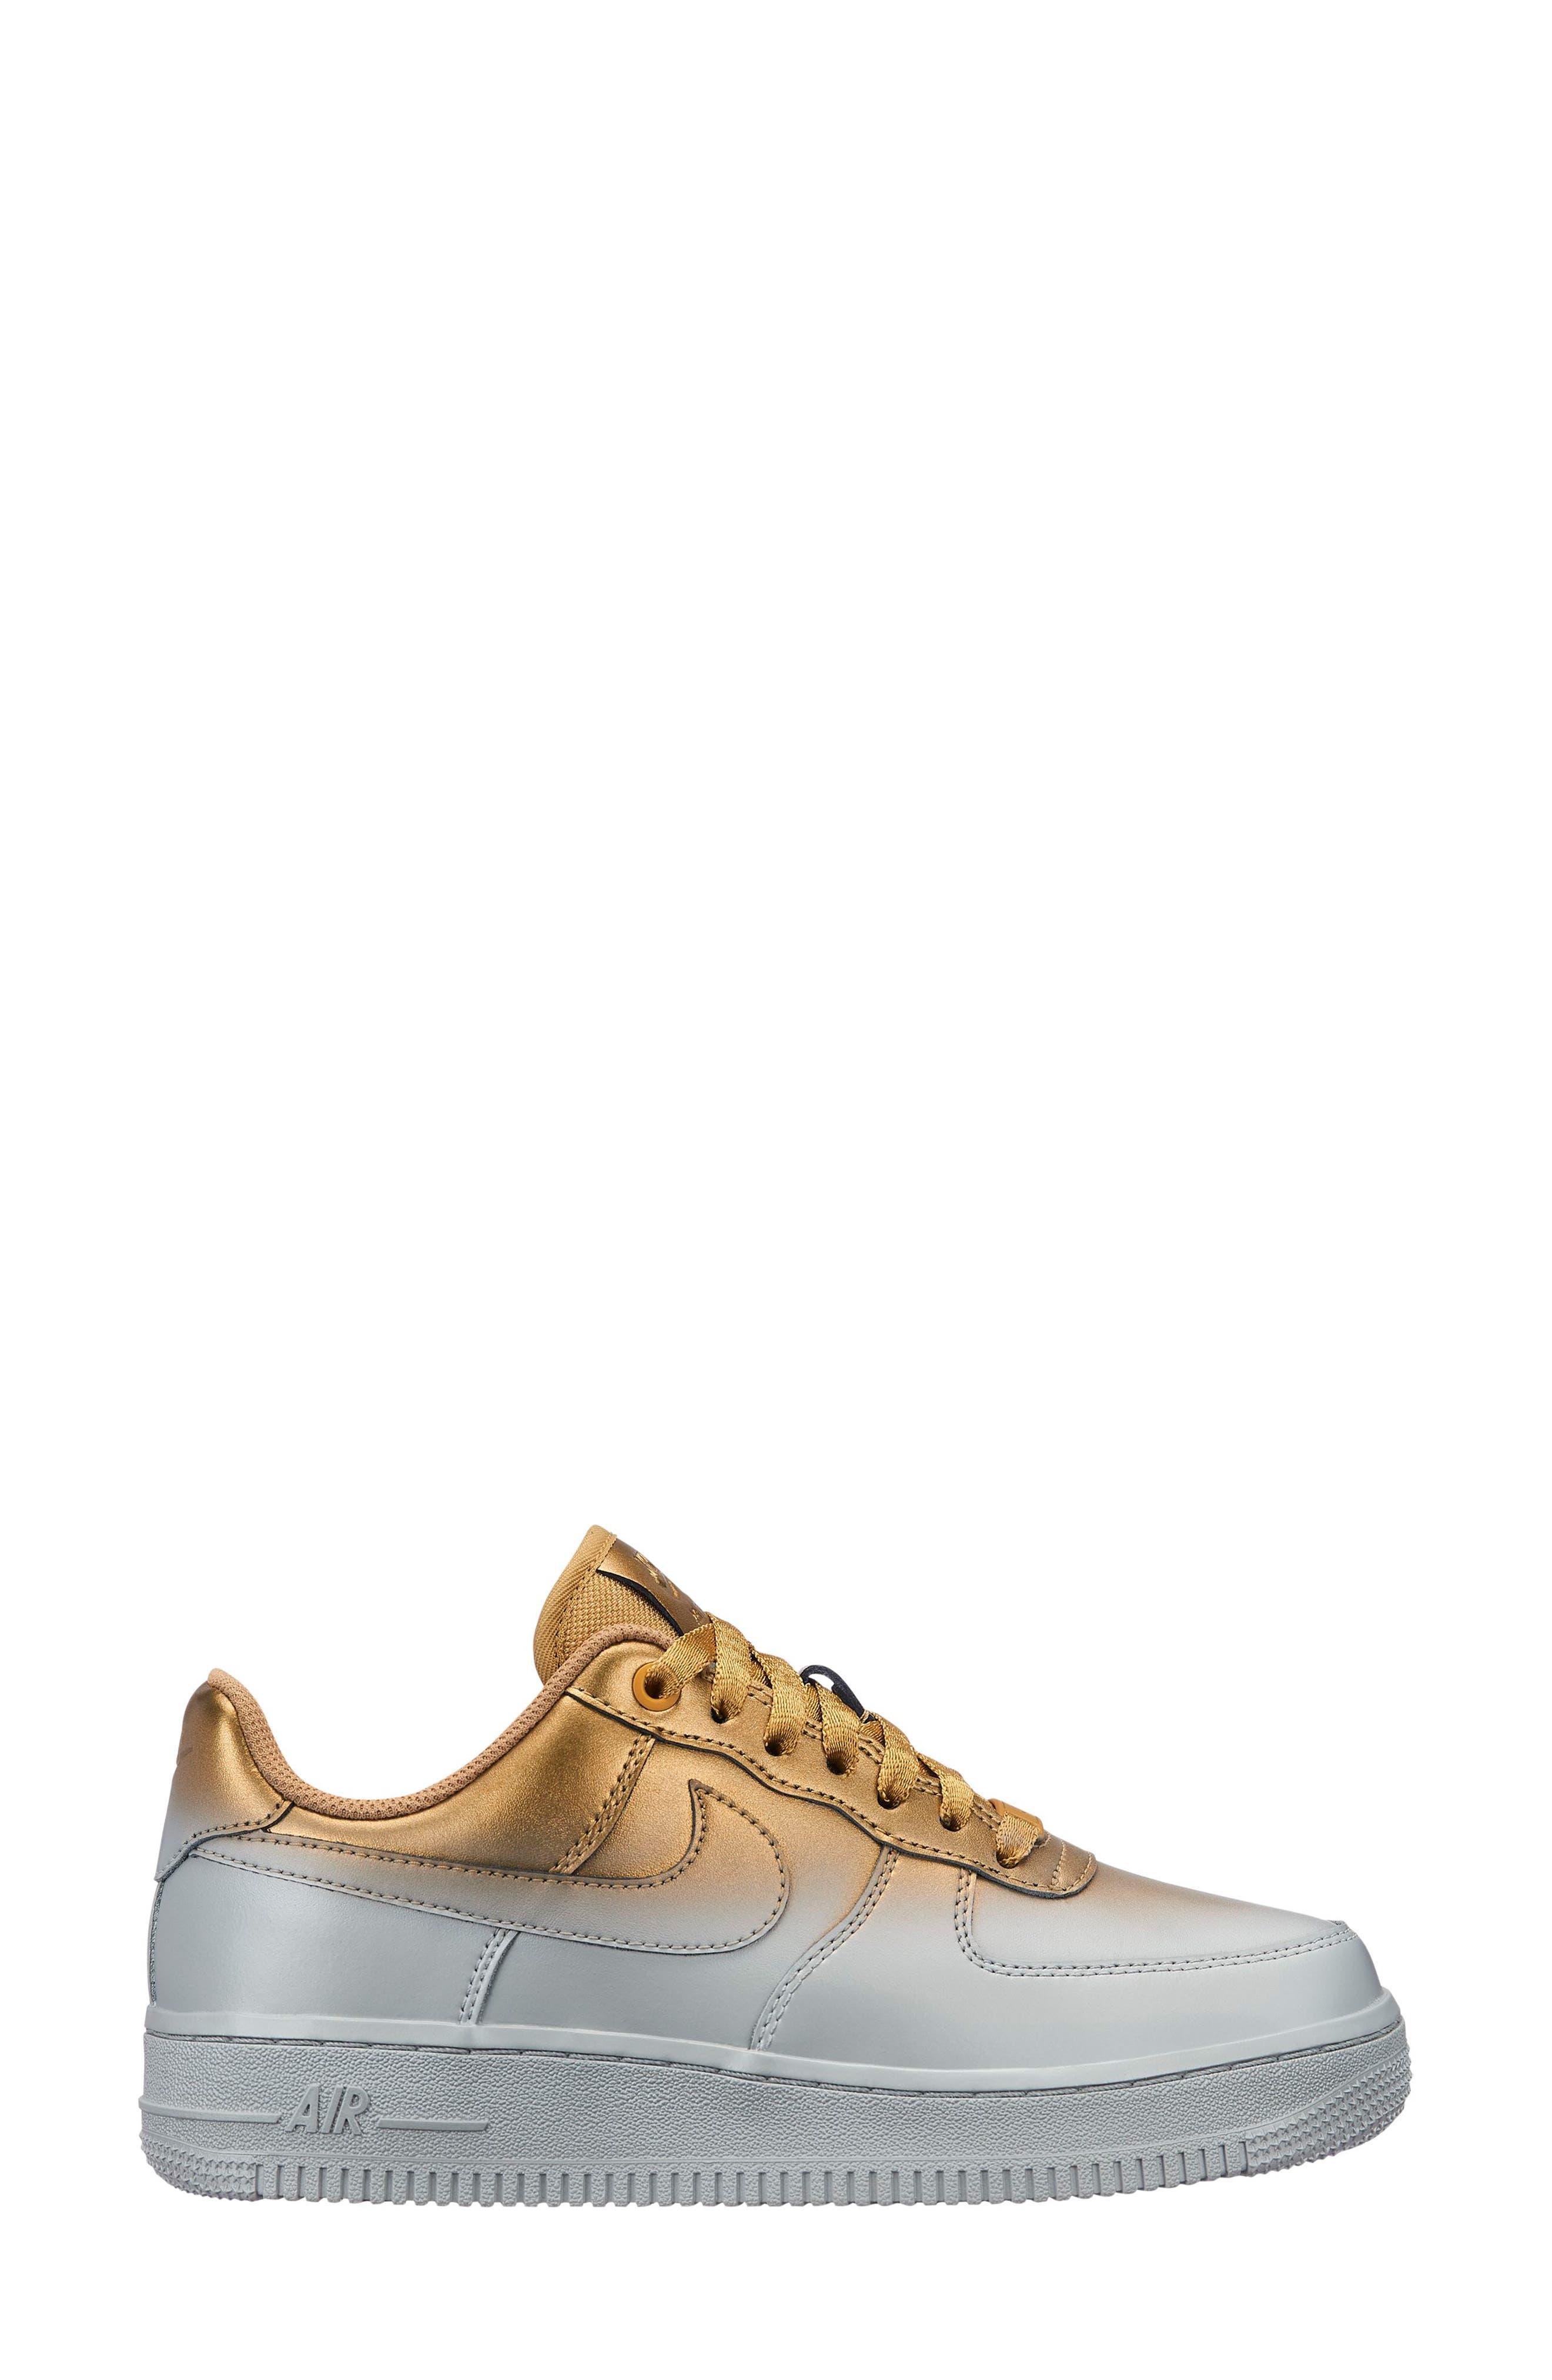 97ccb9e23e3 Nike Women s Shoes